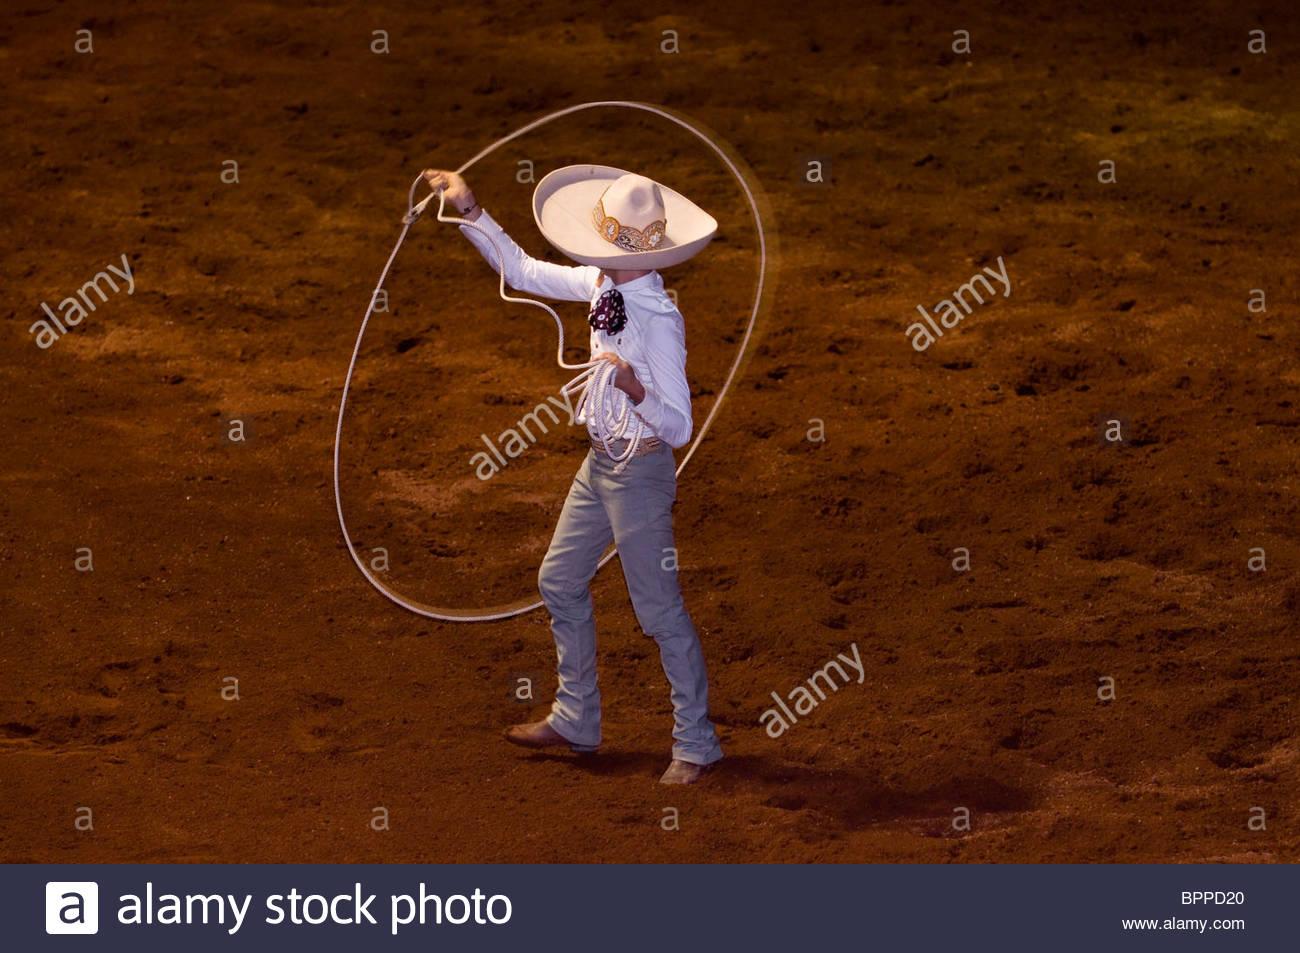 Eine Charreada (mexikanische Rodeo) auf dem Lienzo Charro Zermeno, Guadalajara, Jalisco, Mexiko Stockbild